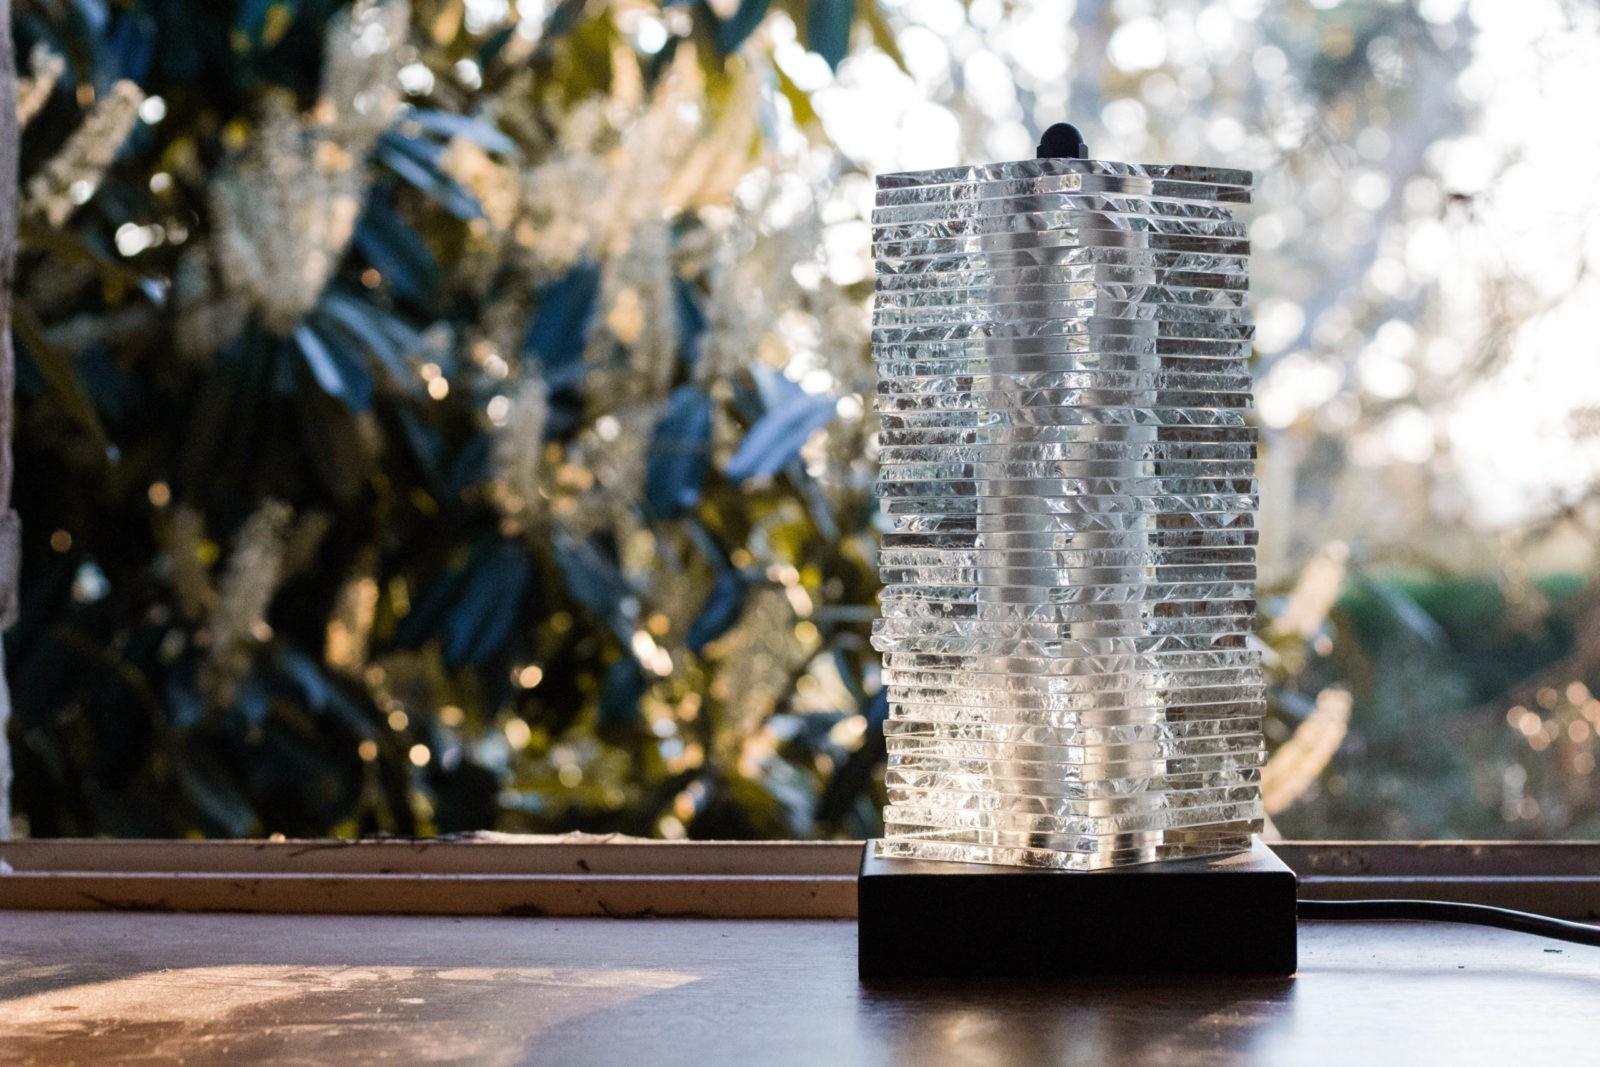 Erèbe lampe nosqua modulable intérieur verre